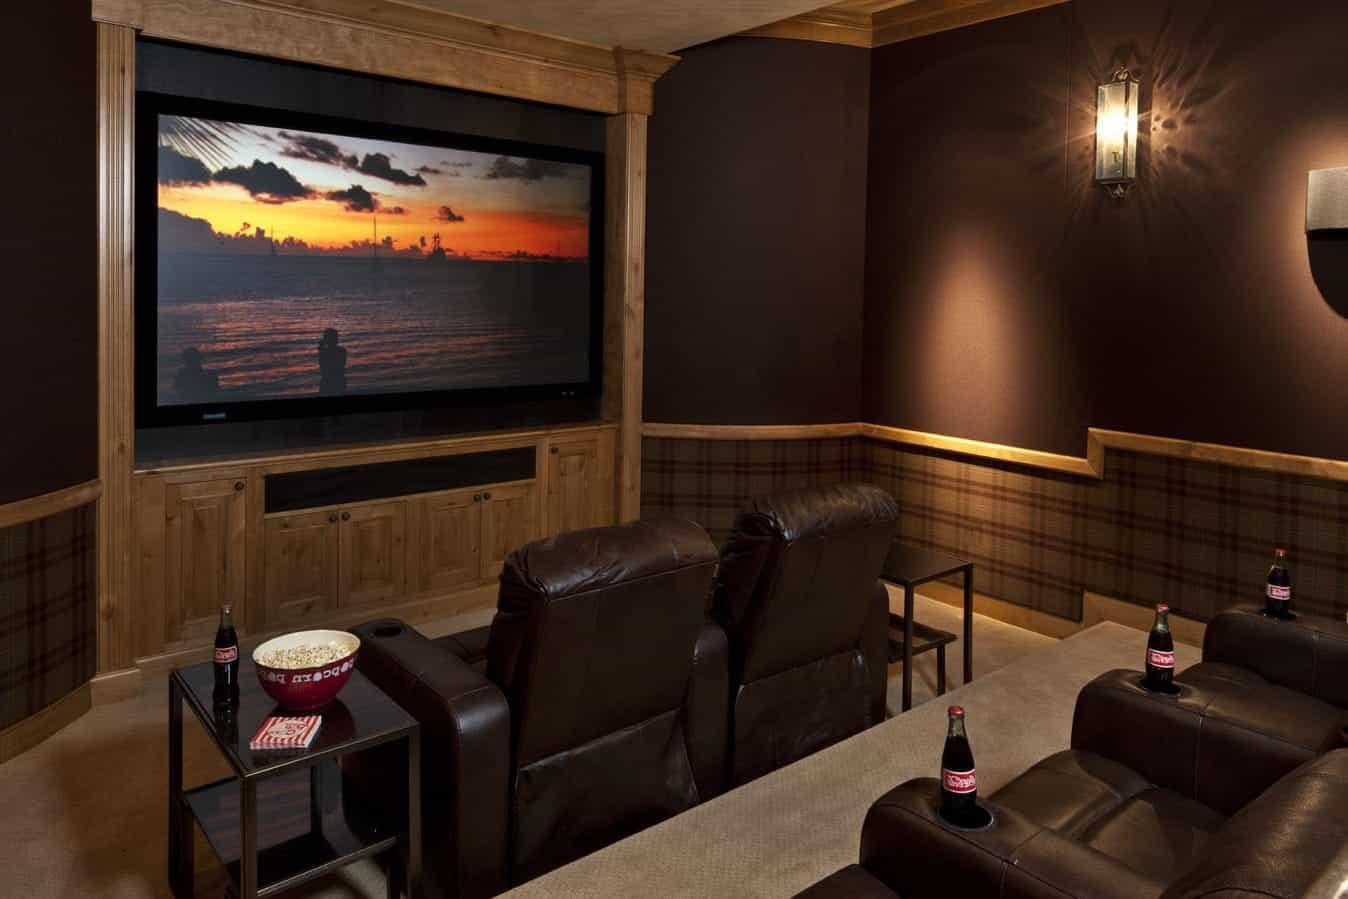 Rustic Home Theater Interior Design (Image 17 of 21)